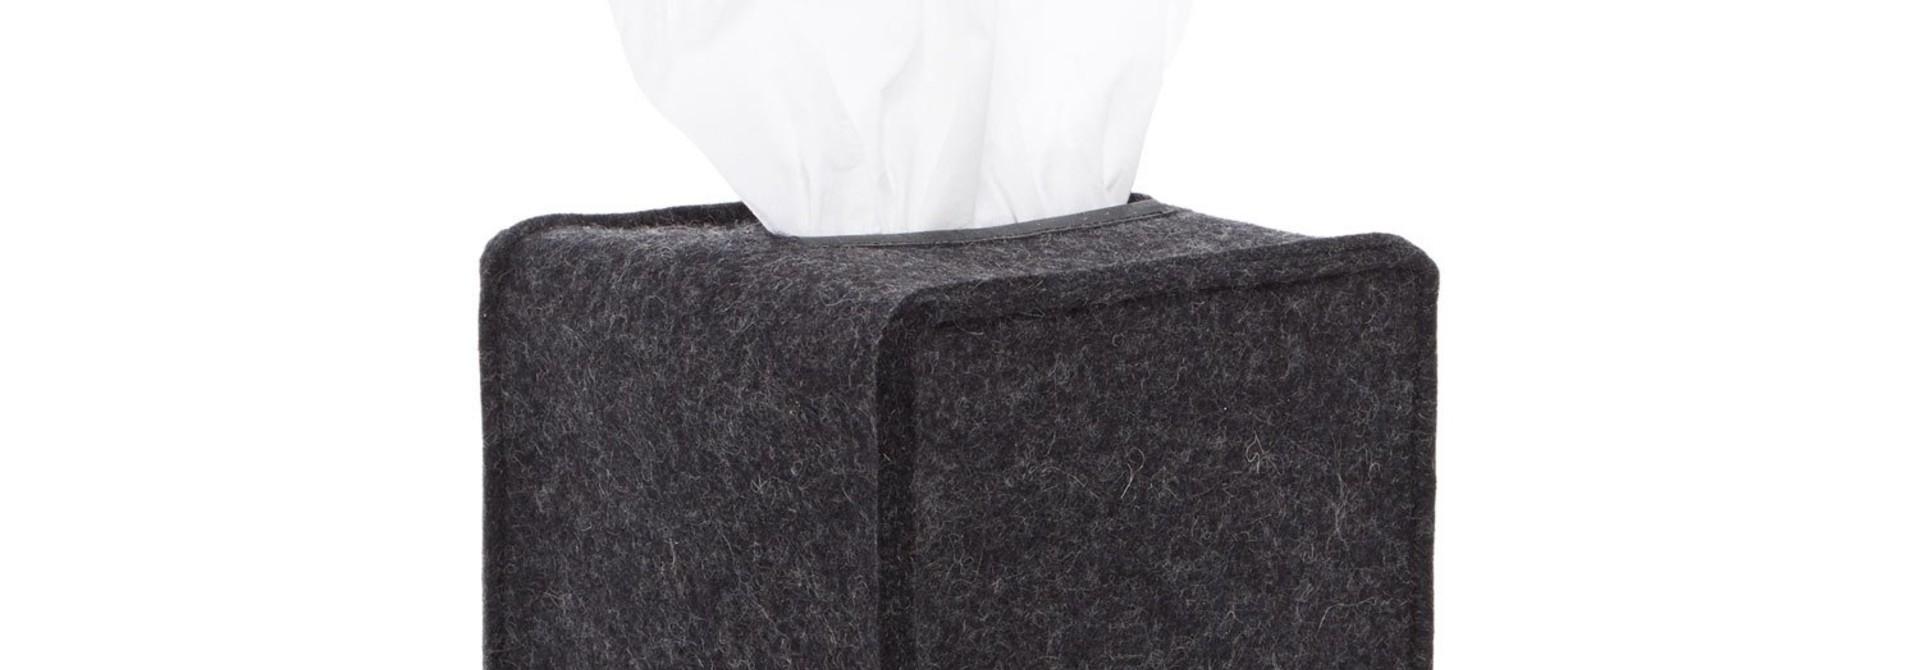 Felt Tissue Box Cover Small - Charcoal